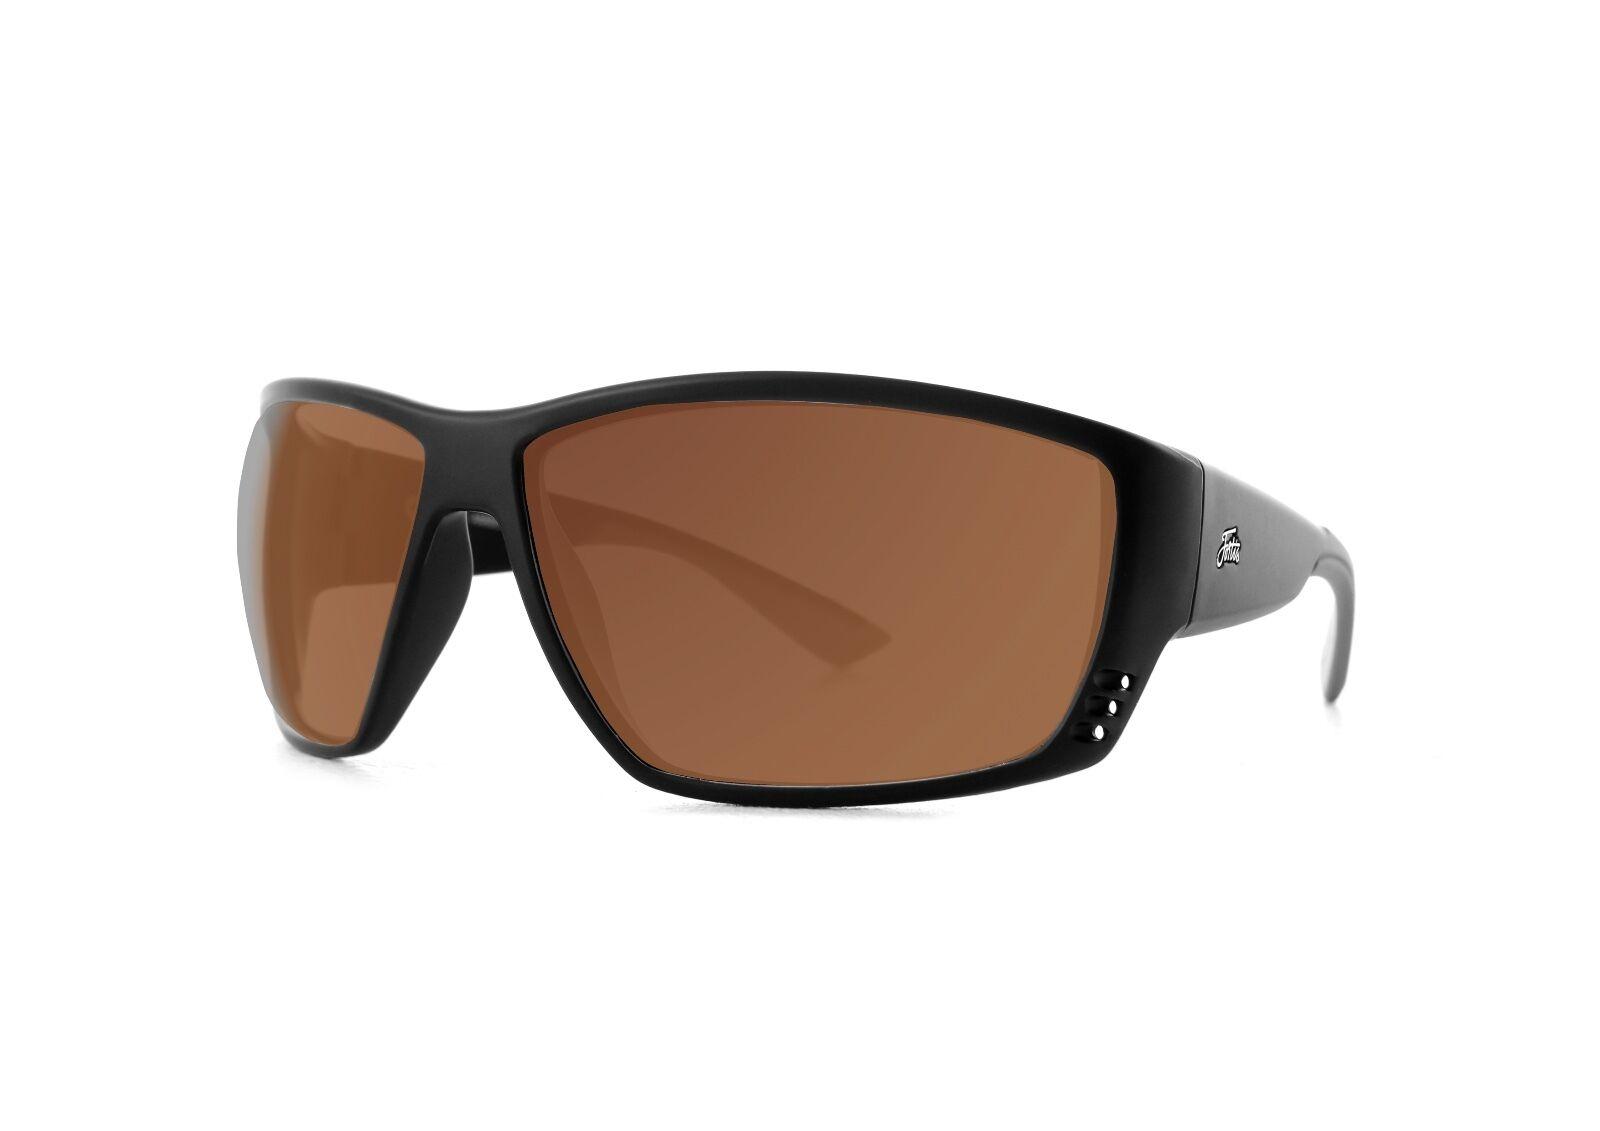 Fortis Fortis Fortis Vista 247 Sunglasses with braun Polarised Lens (VA001) 02c175